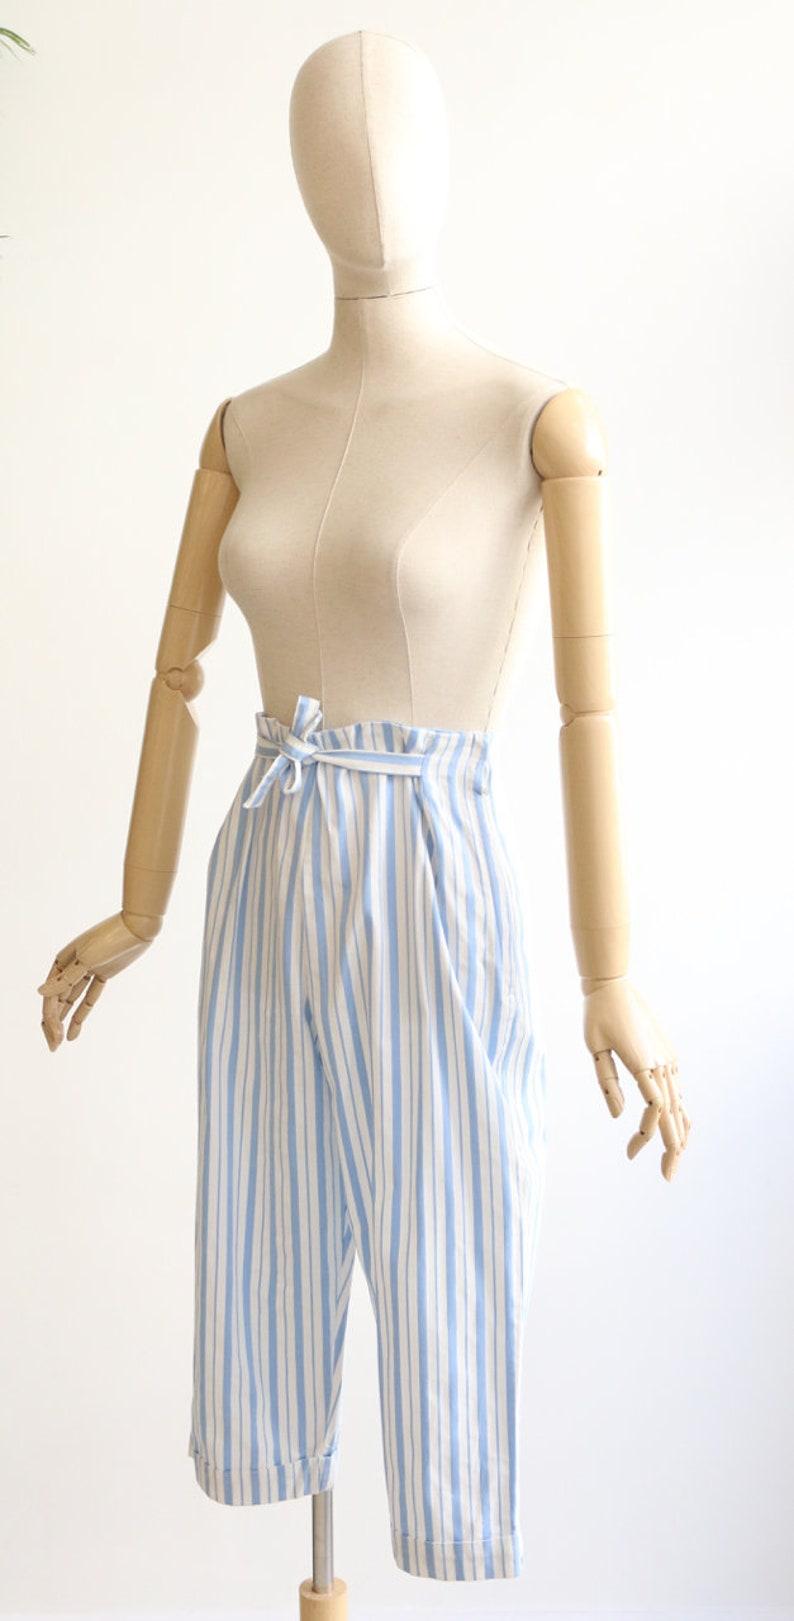 Vintage 1950/'s Capri pants vintage 1950/'s high waisted capris 1950/'s pinstripe pedal pushers 1950/'s fashion original 1950s cotton capri UK 8